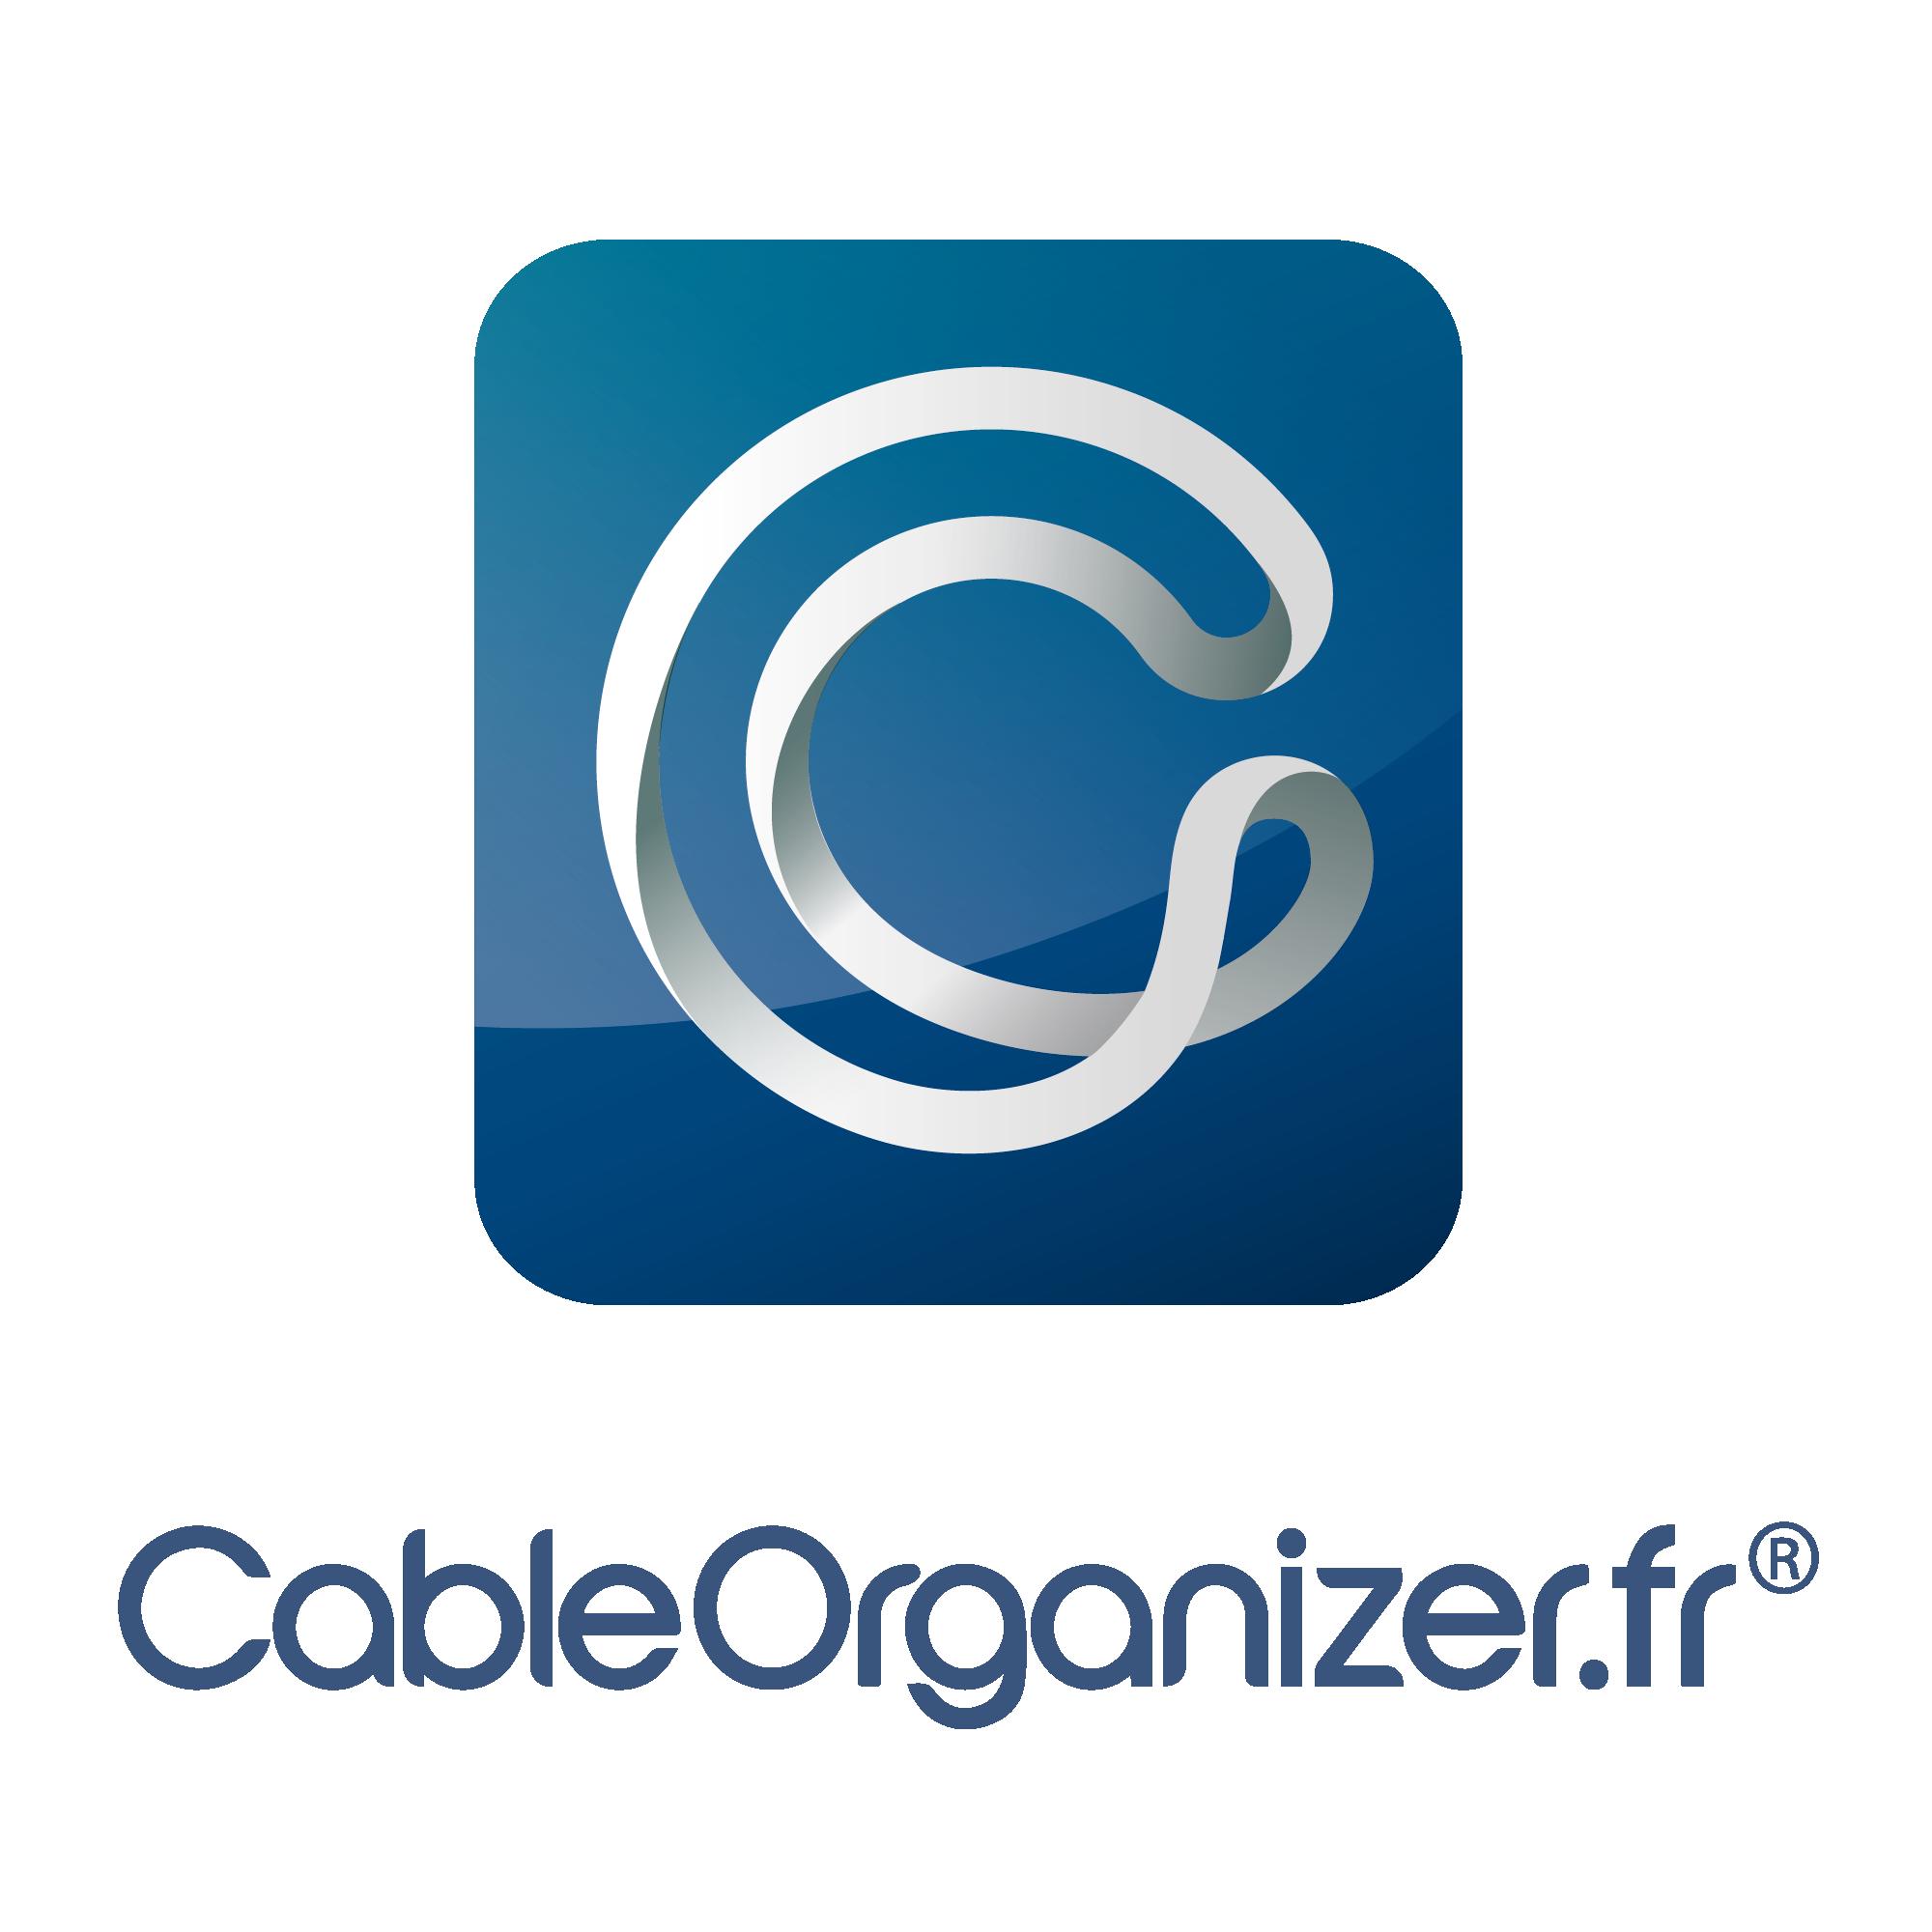 CableOrganizer®